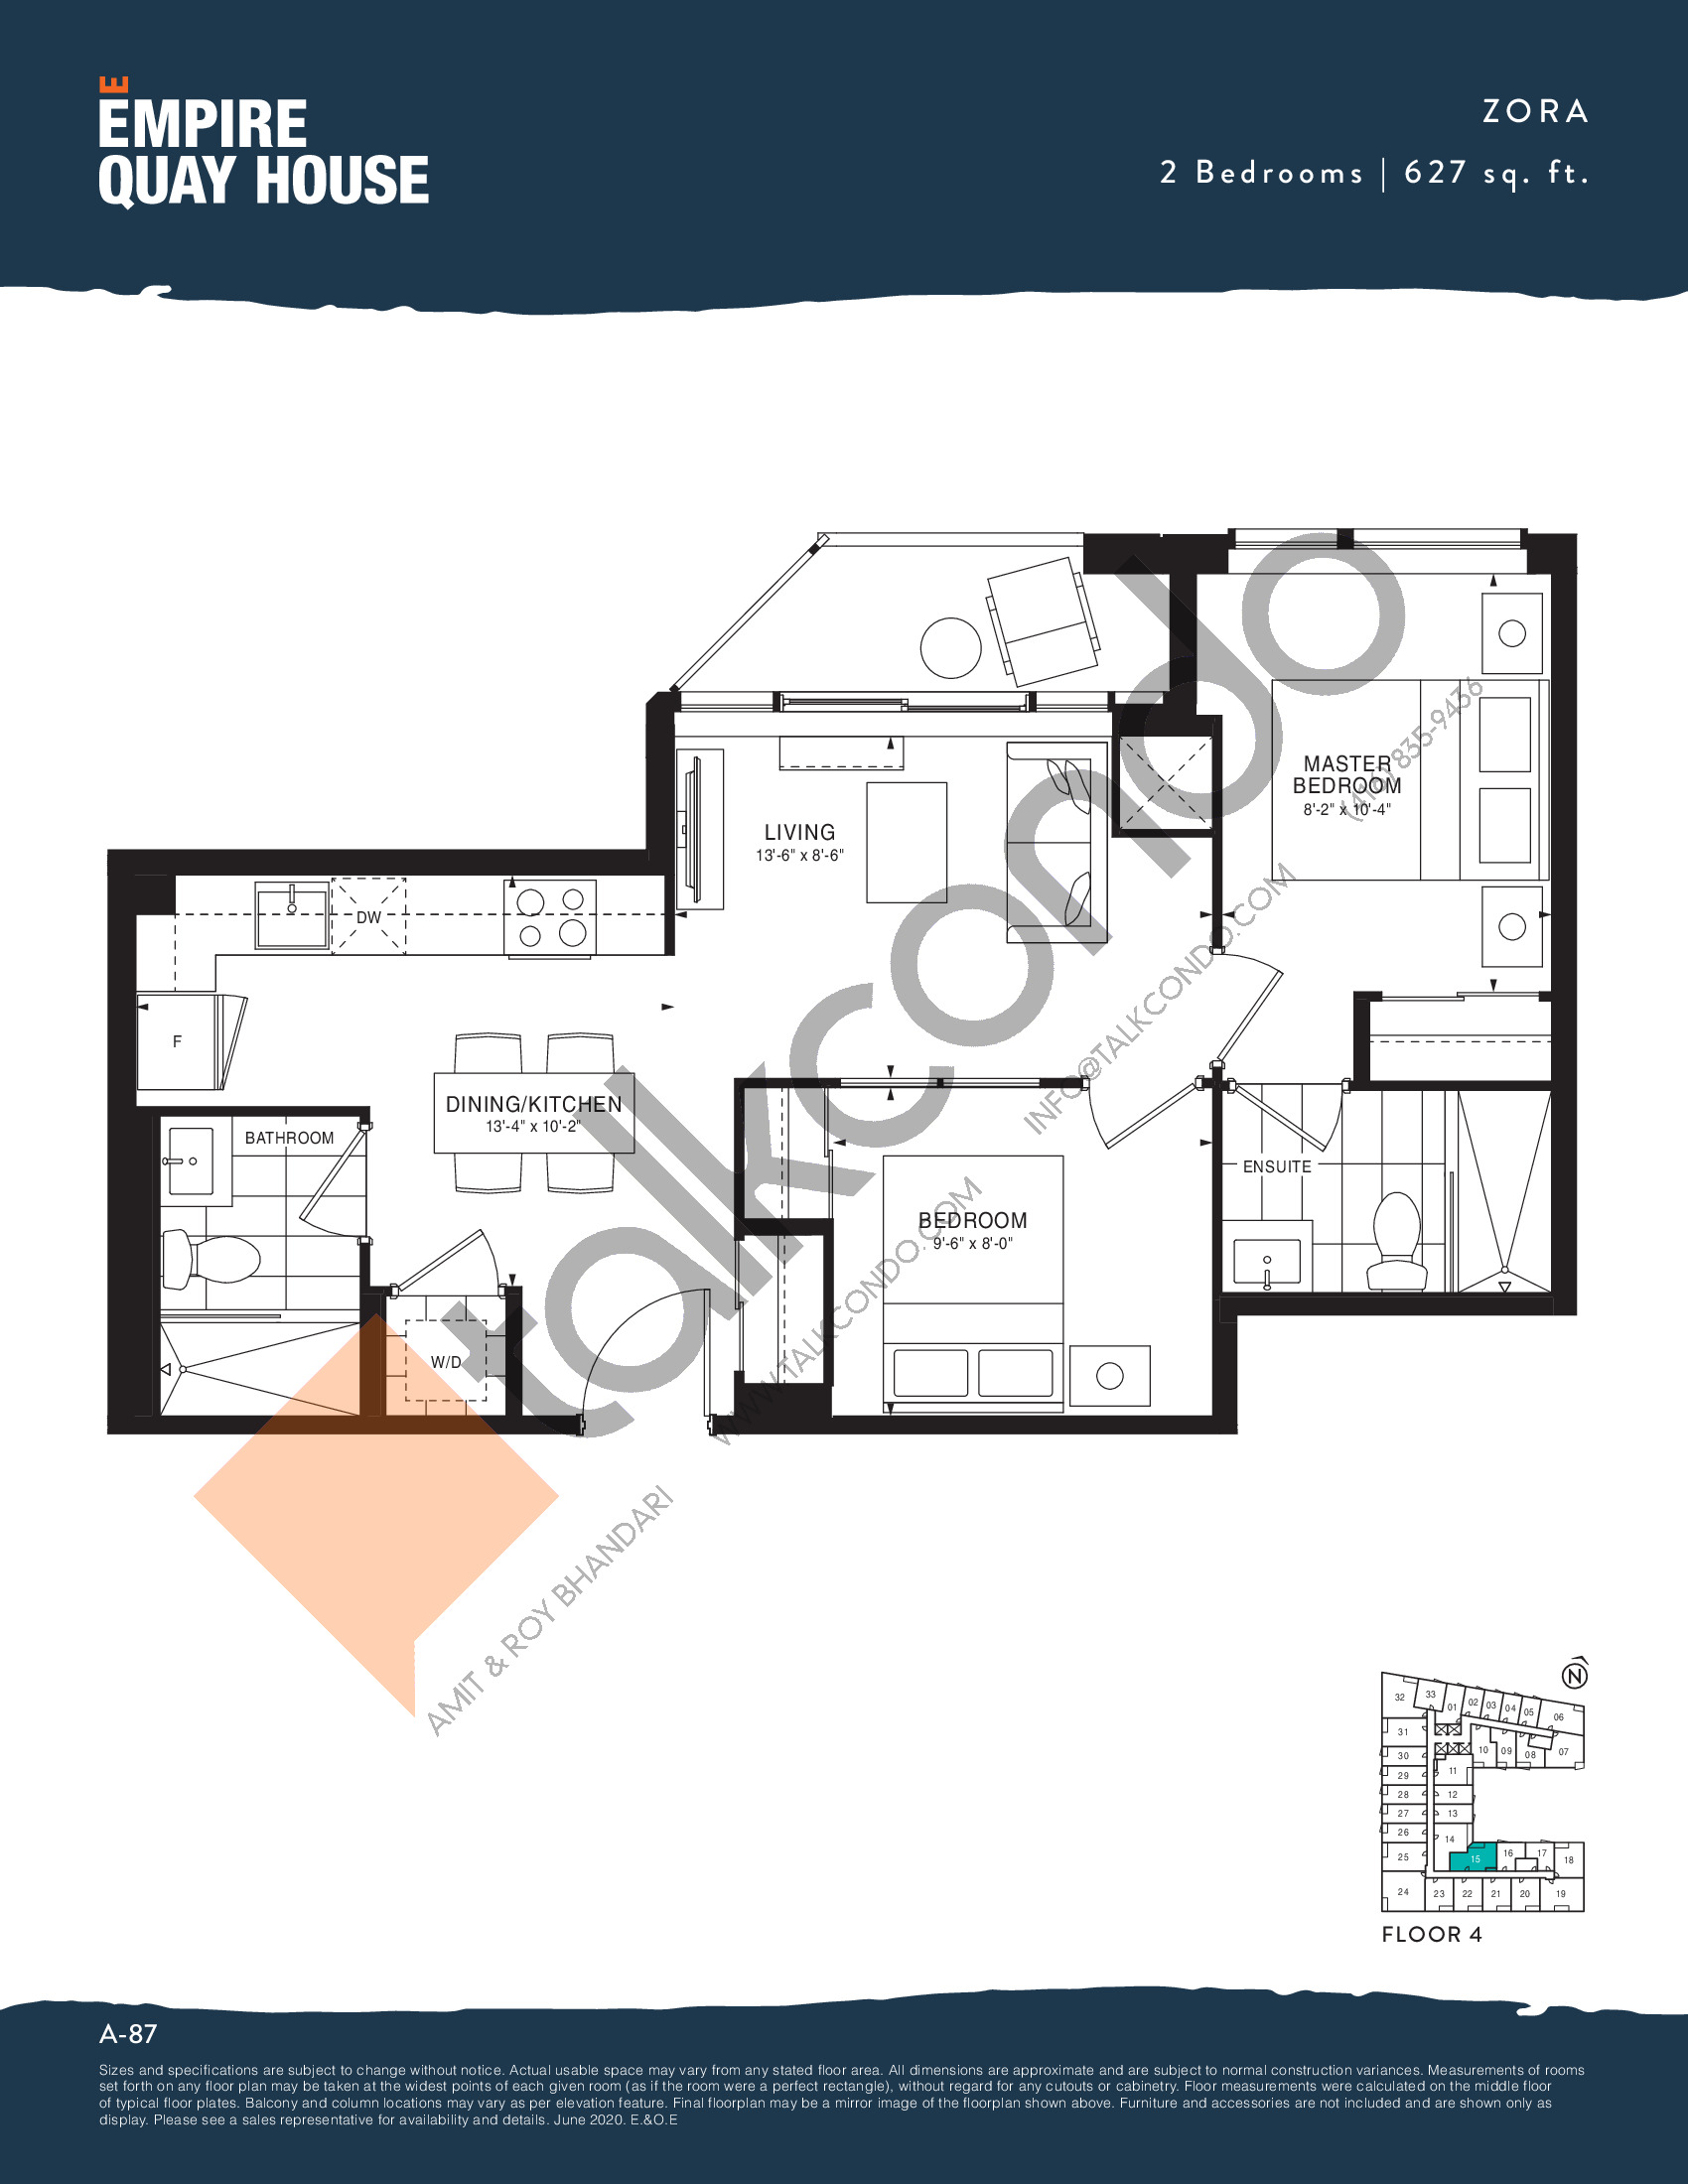 Zora Floor Plan at Empire Quay House Condos - 627 sq.ft